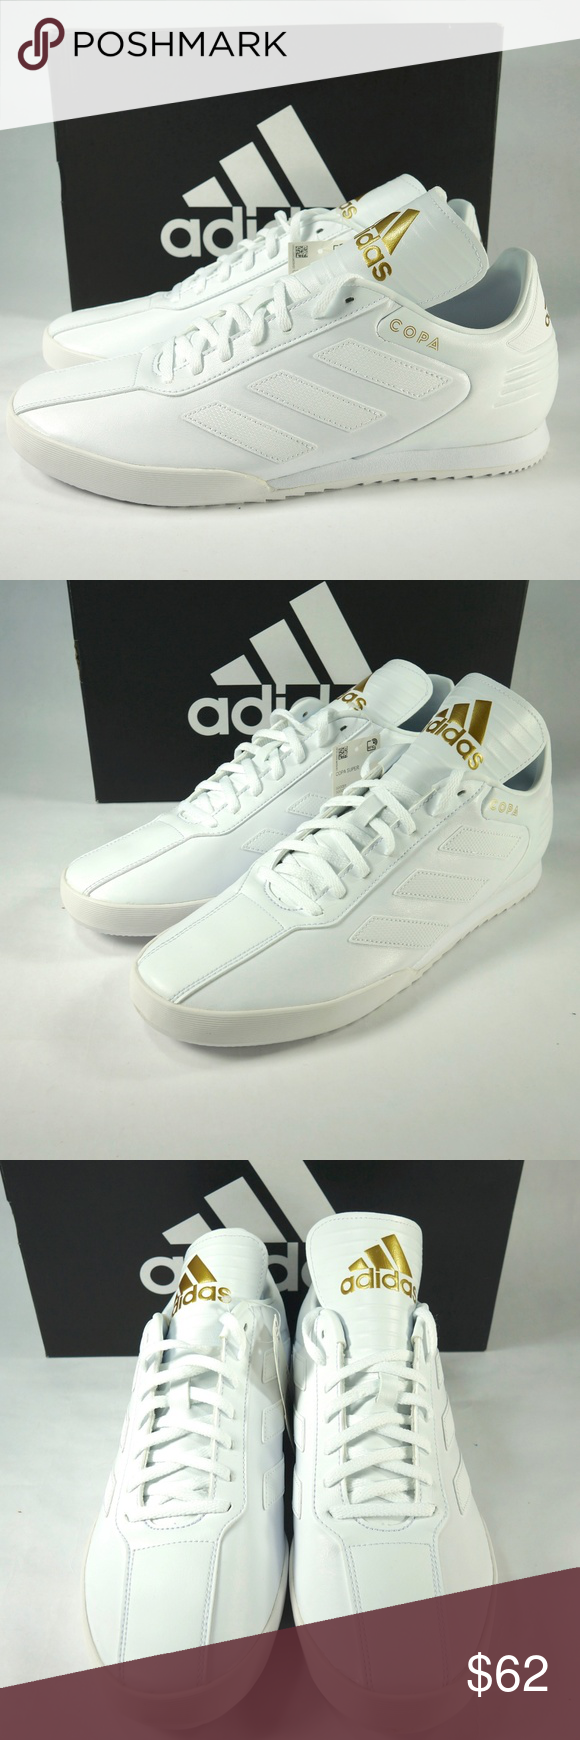 6527cb3b1eb Adidas Copa Super Indoor Soccer Shoes Brand new